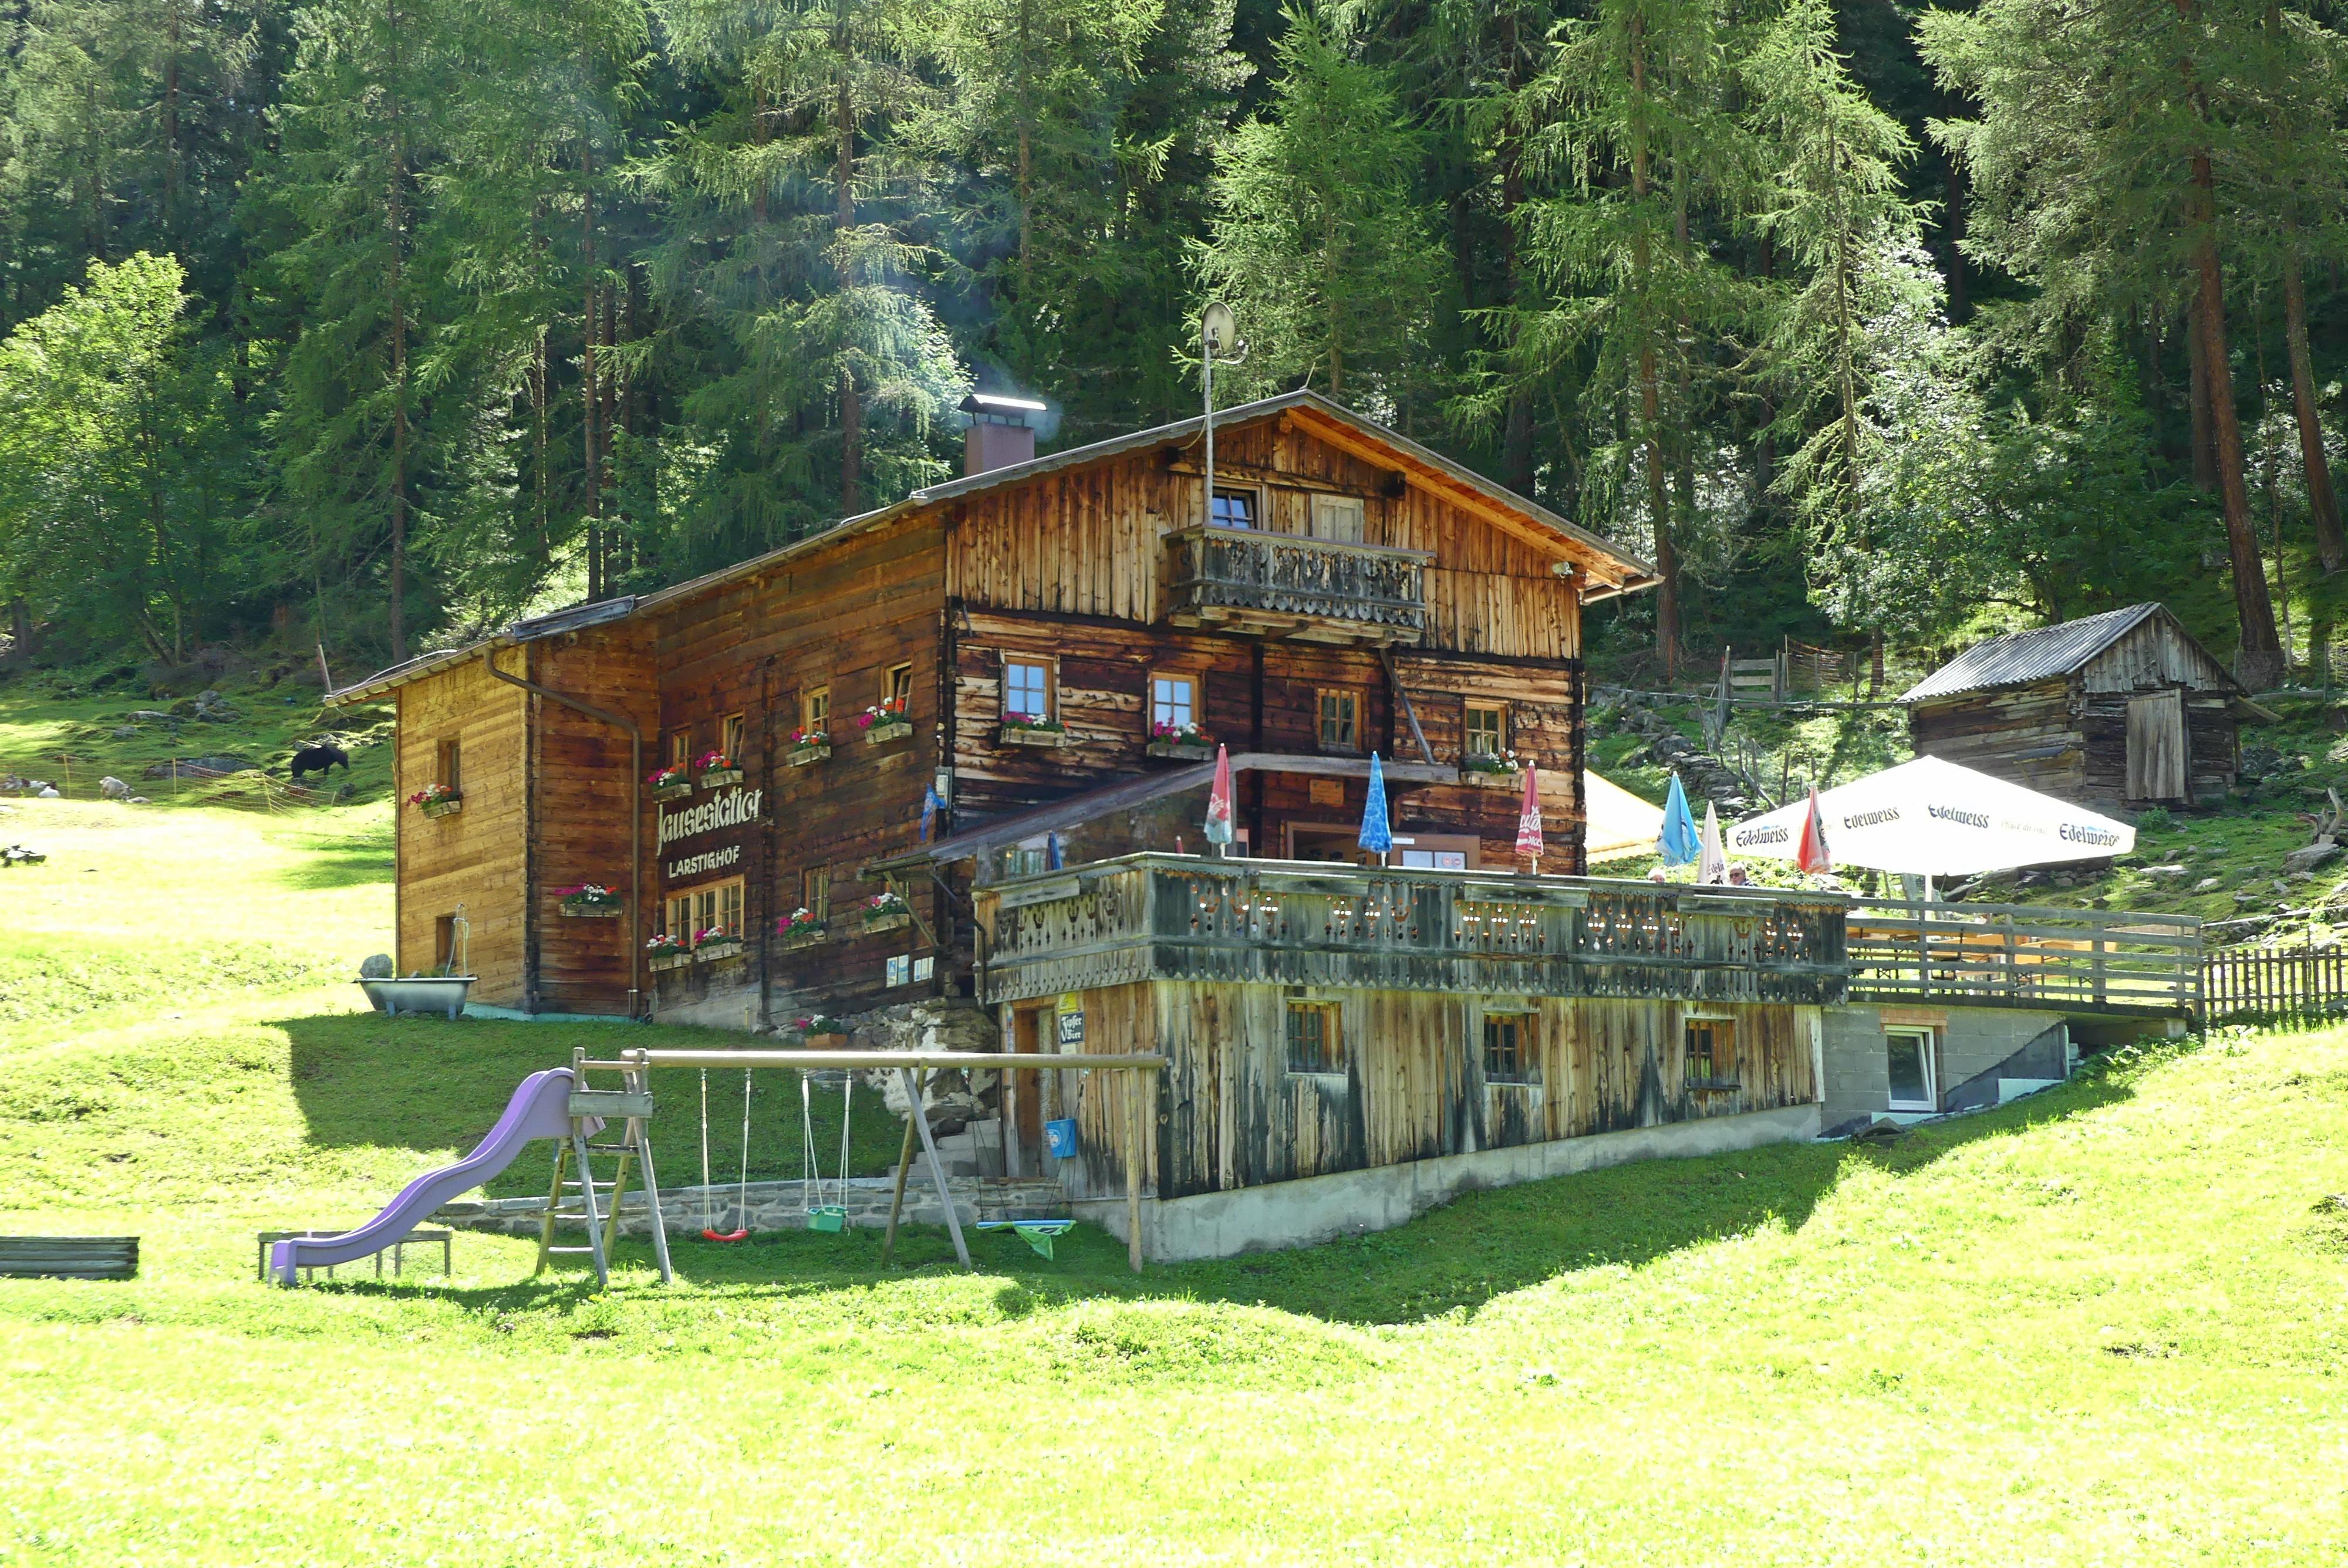 Jausenstation Larstighof